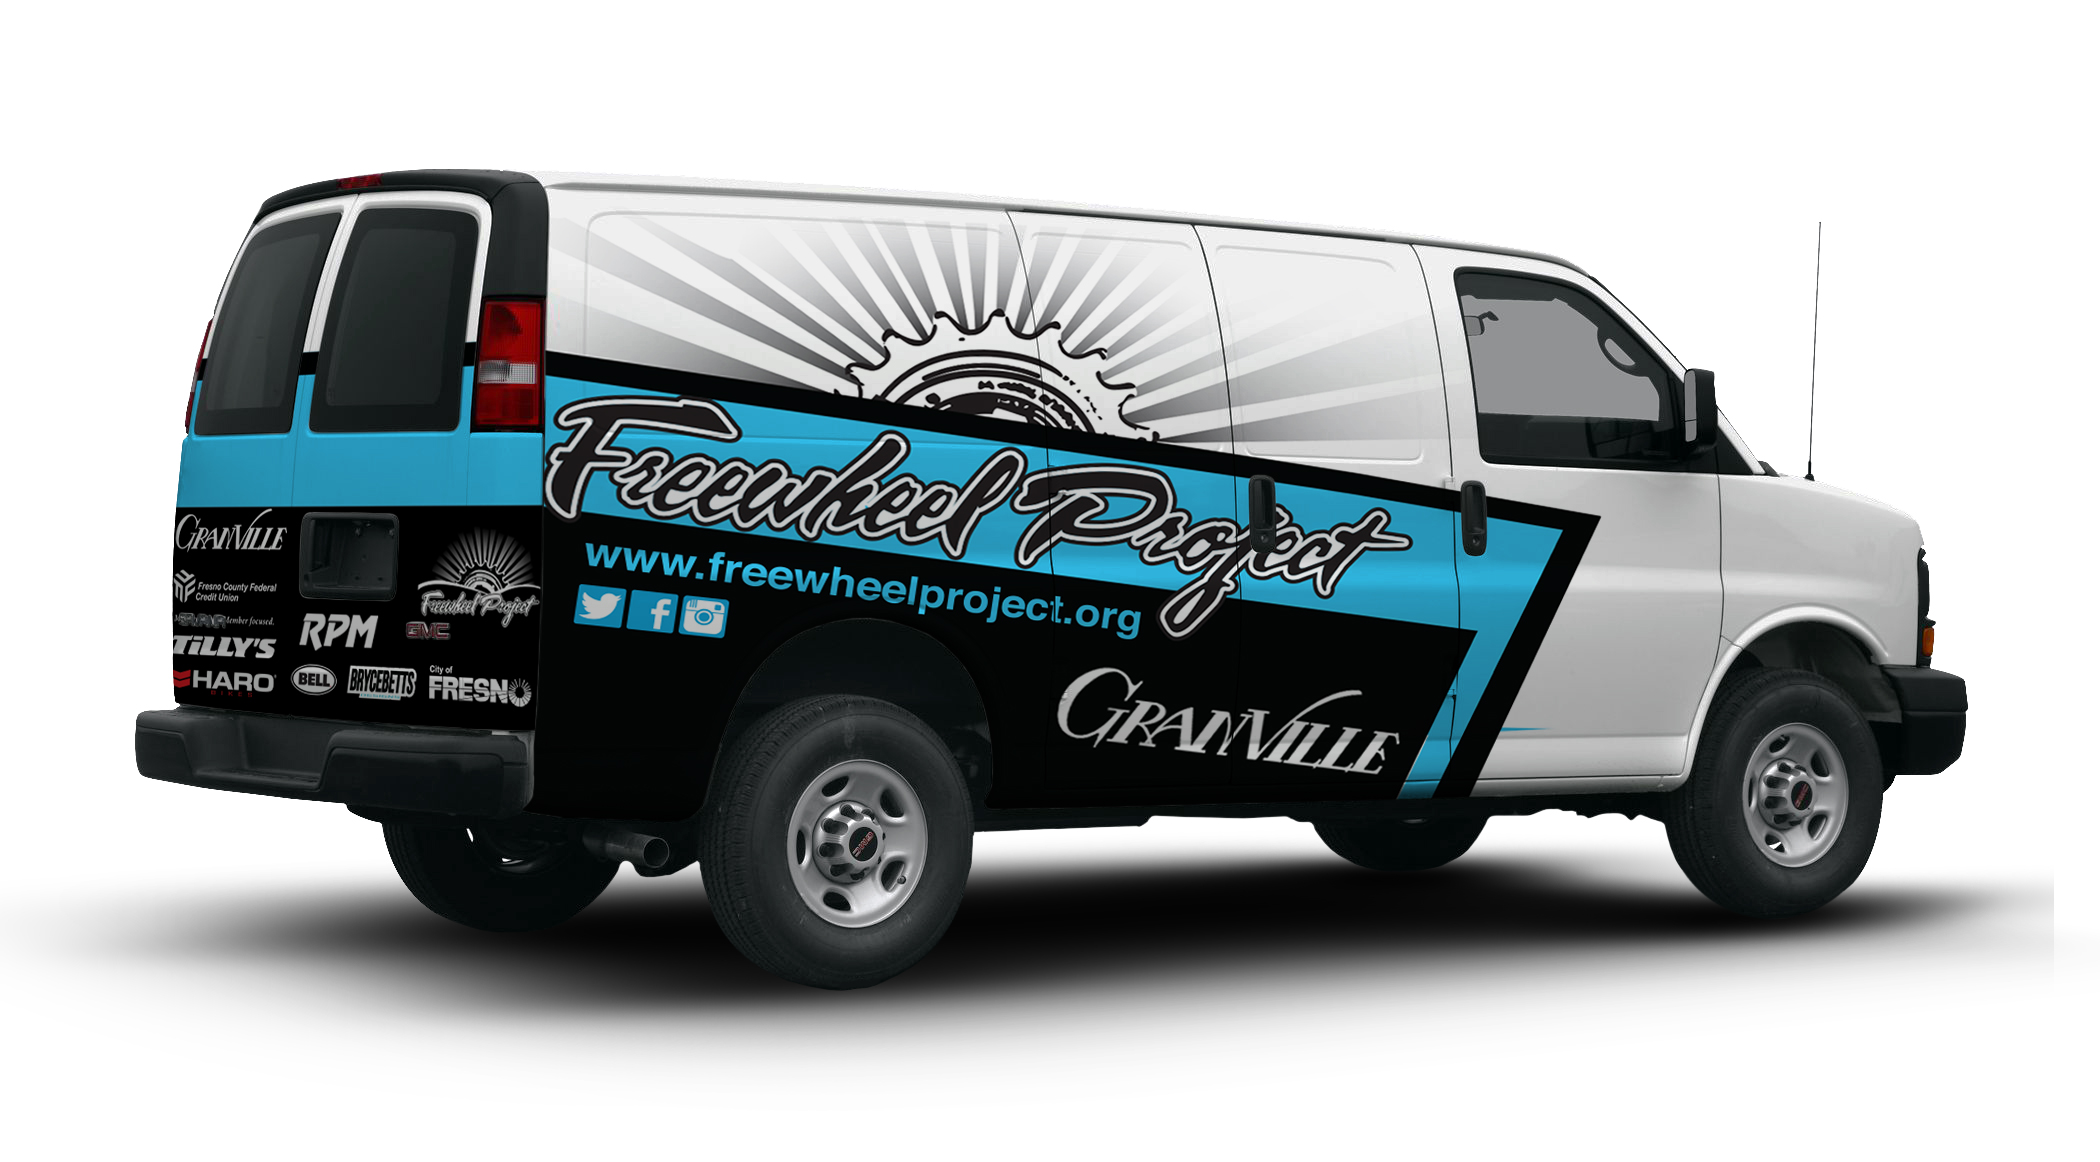 Freewheel Project Van